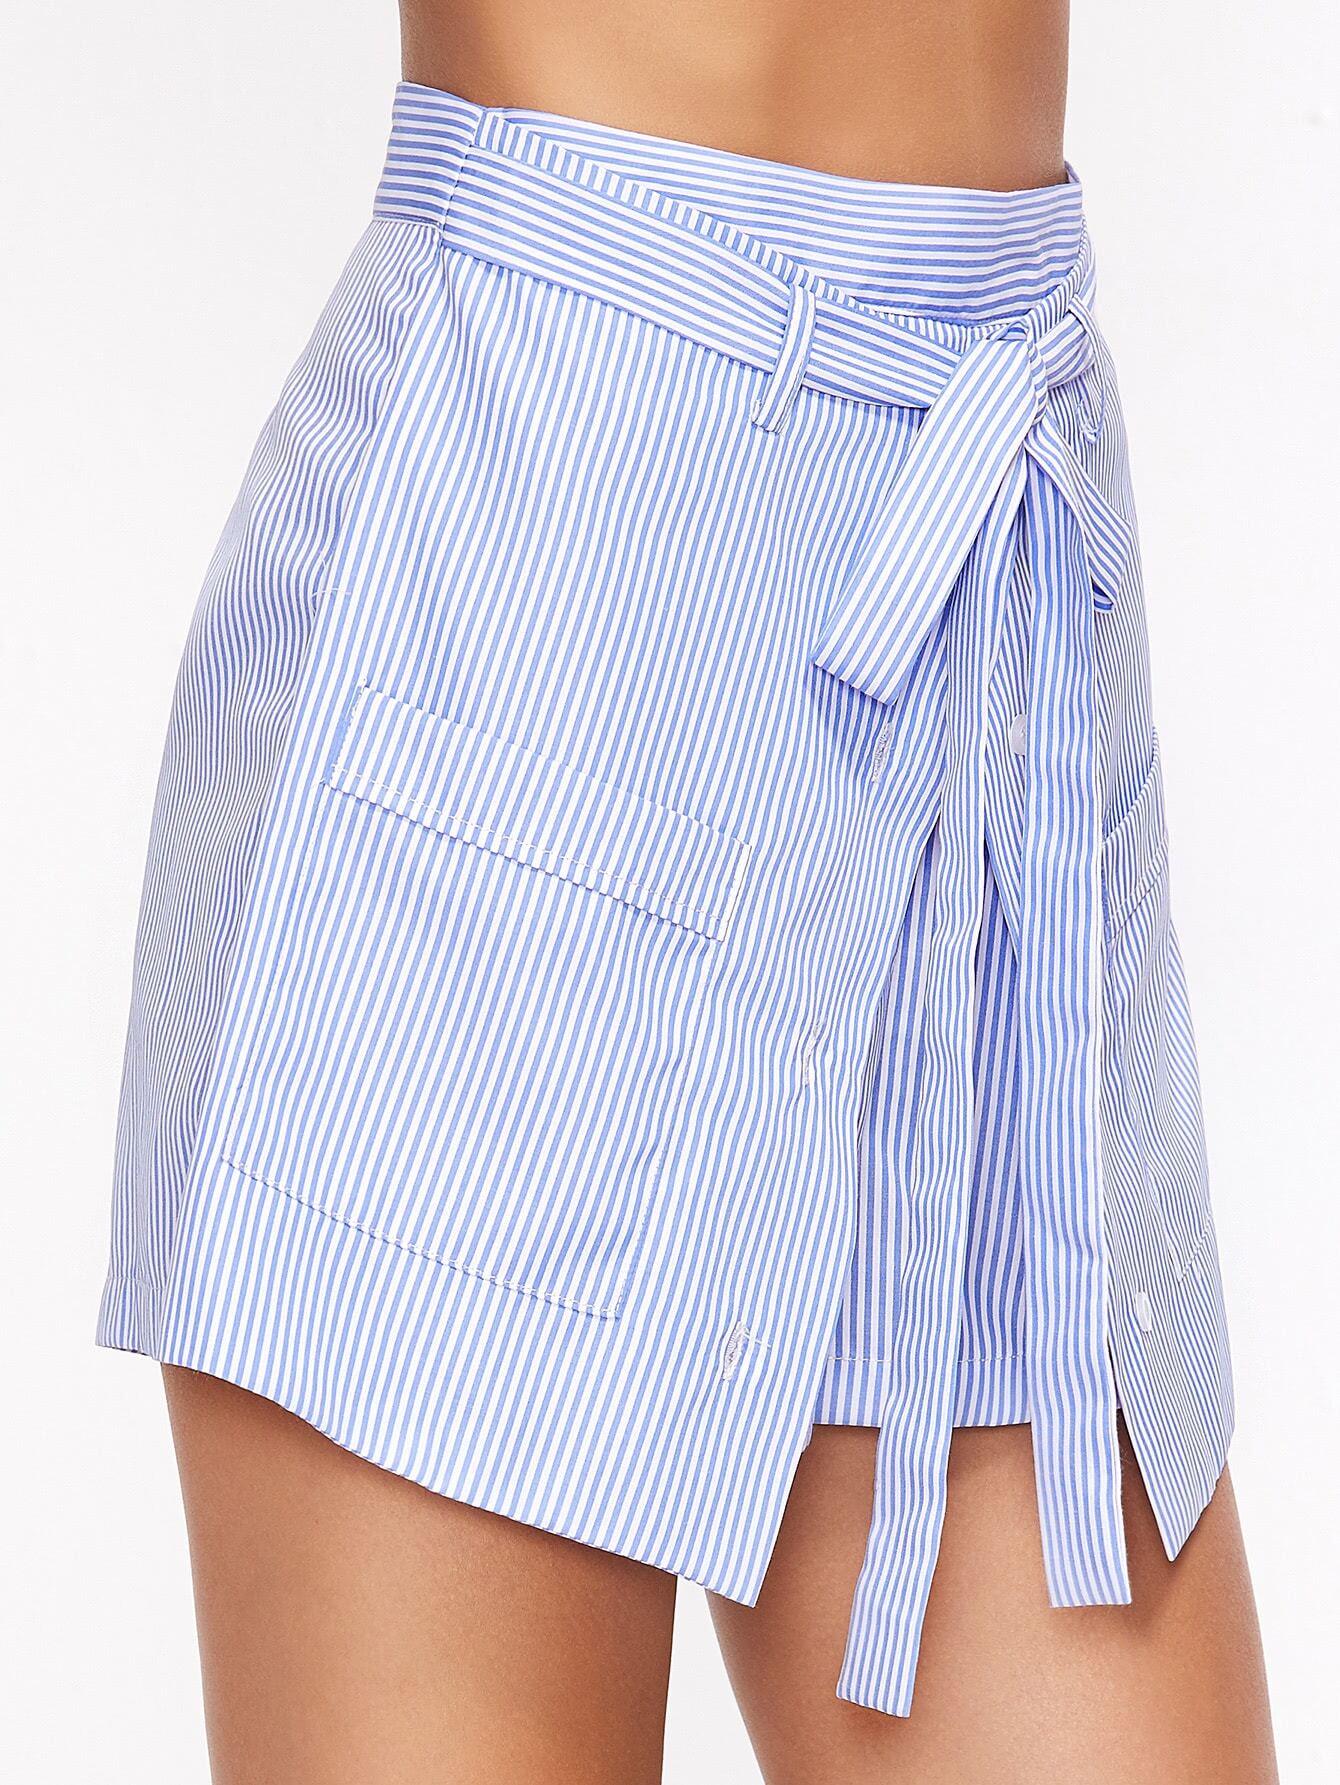 shorts161101701_1